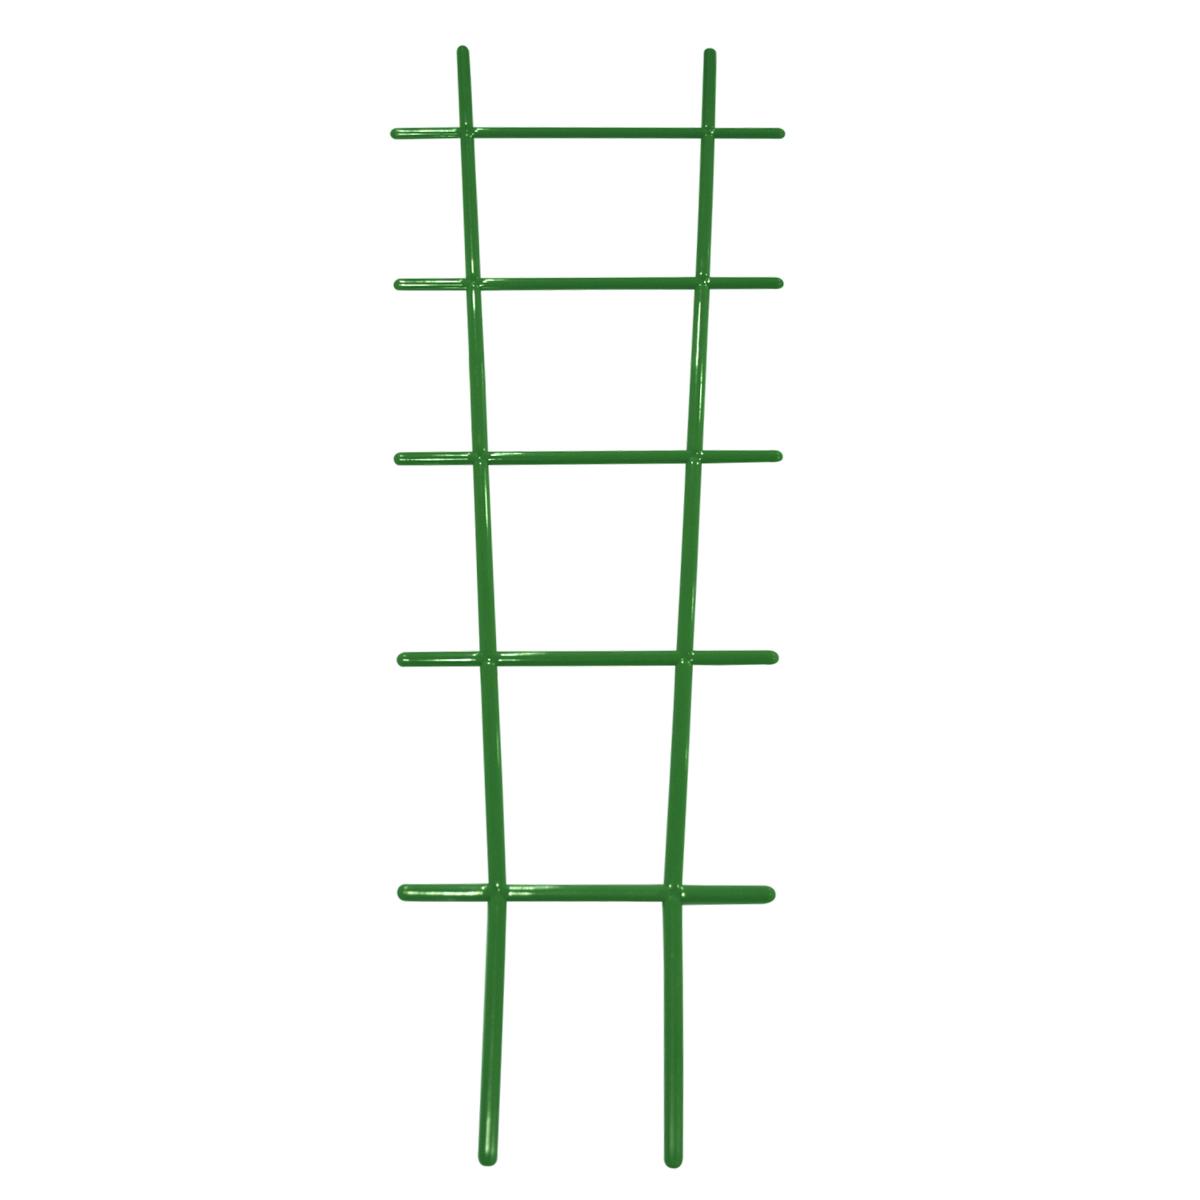 Опора для комнатных растений InGreen, 50 х 18 х 0,4 см опора для растений бамбуковая